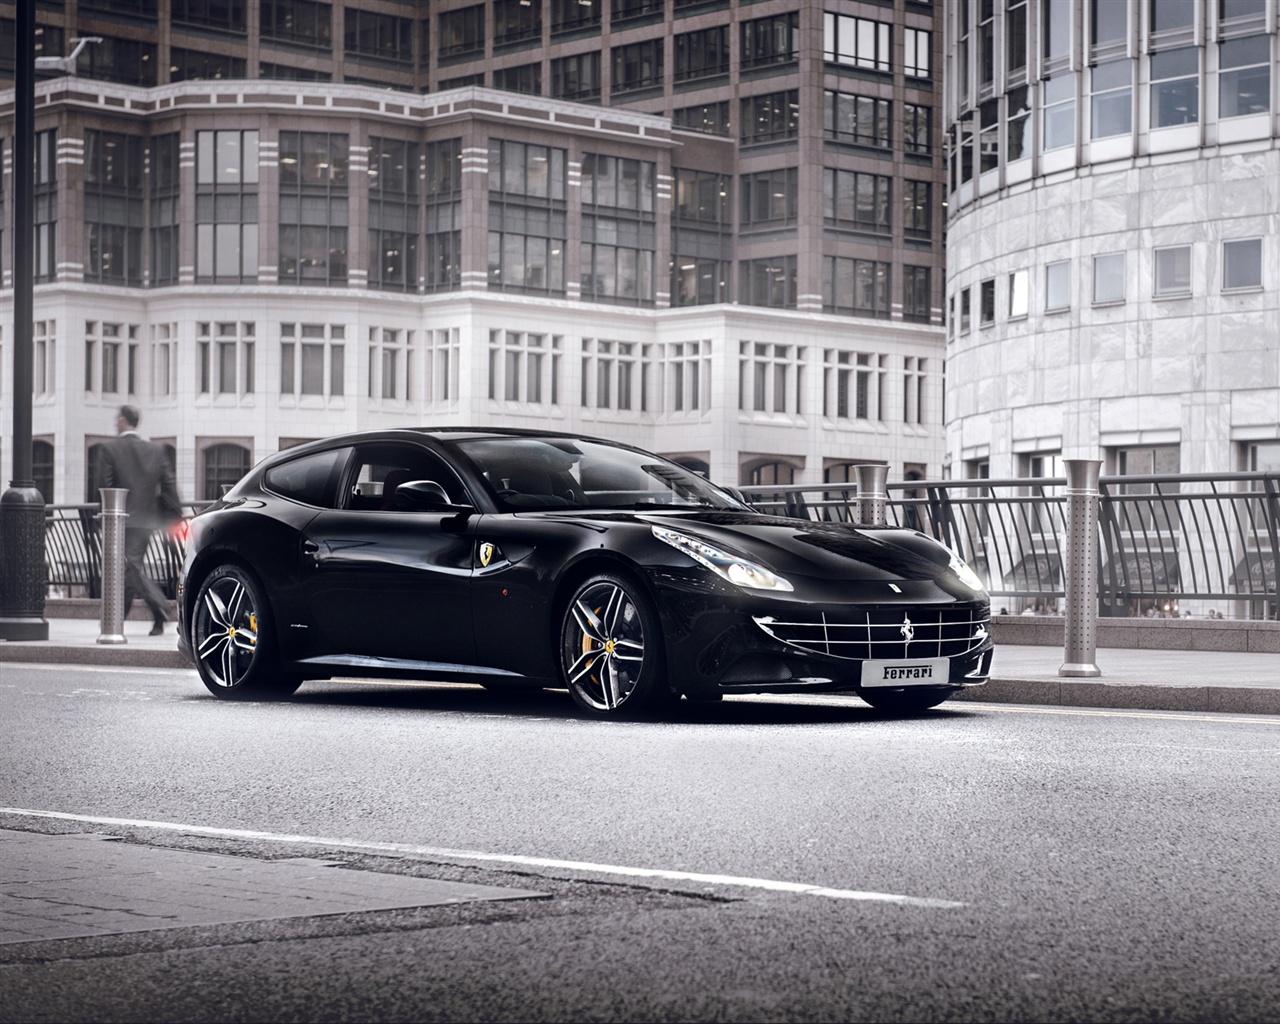 Ferrari Ff Black Supercar At City Street 640x1136 Iphone 5 5s 5c Se Wallpaper Background Picture Image